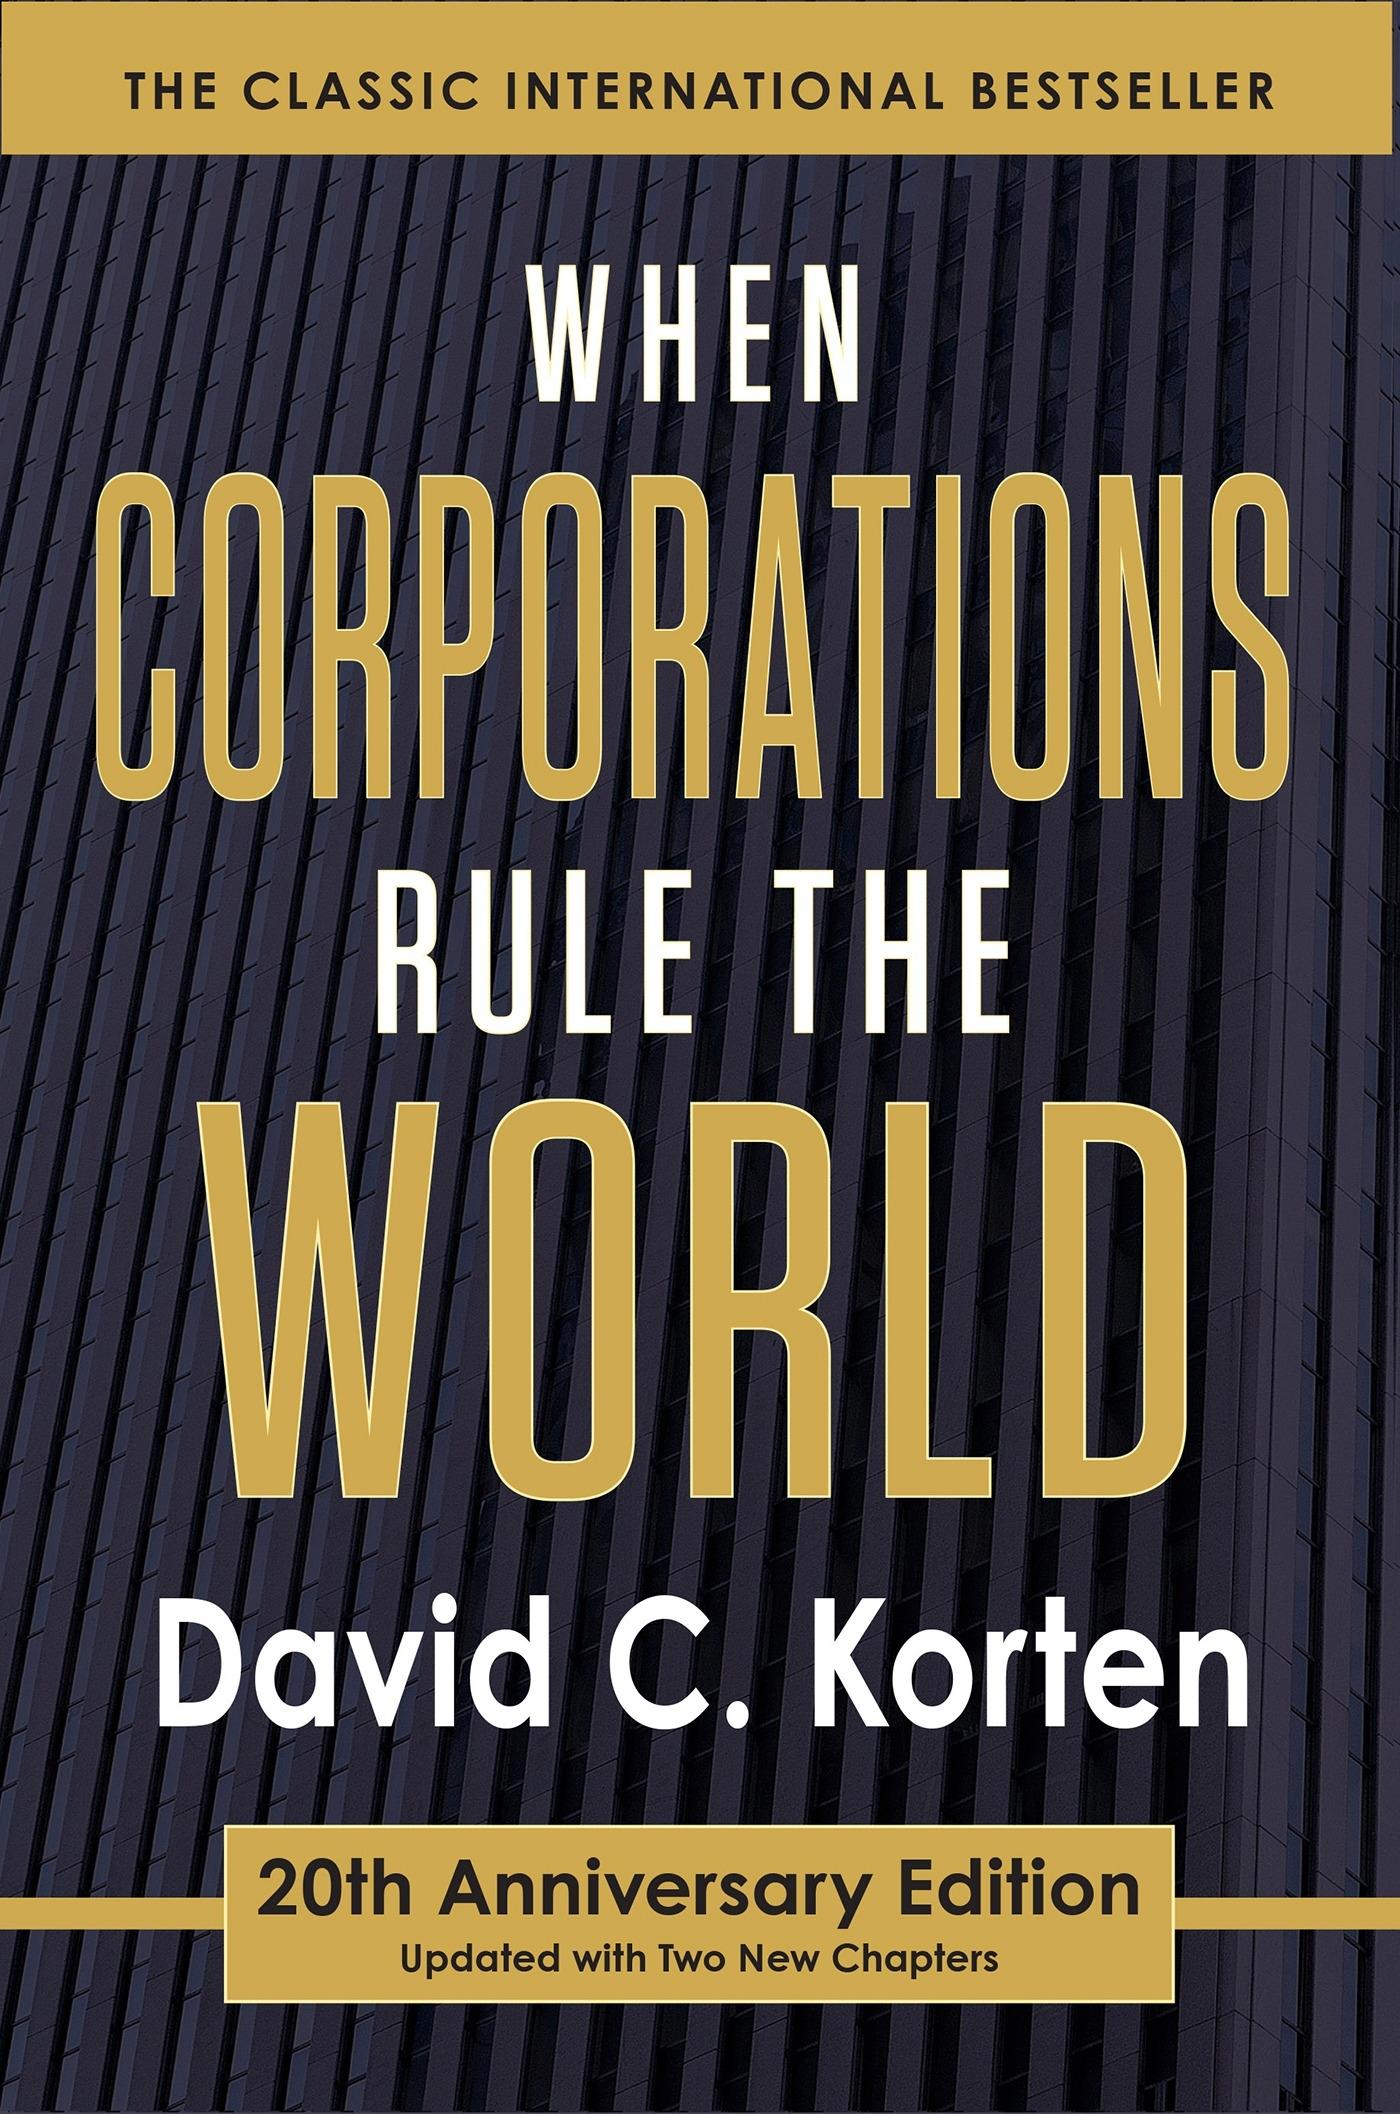 Read When Corporations Rule The World By David C Korten